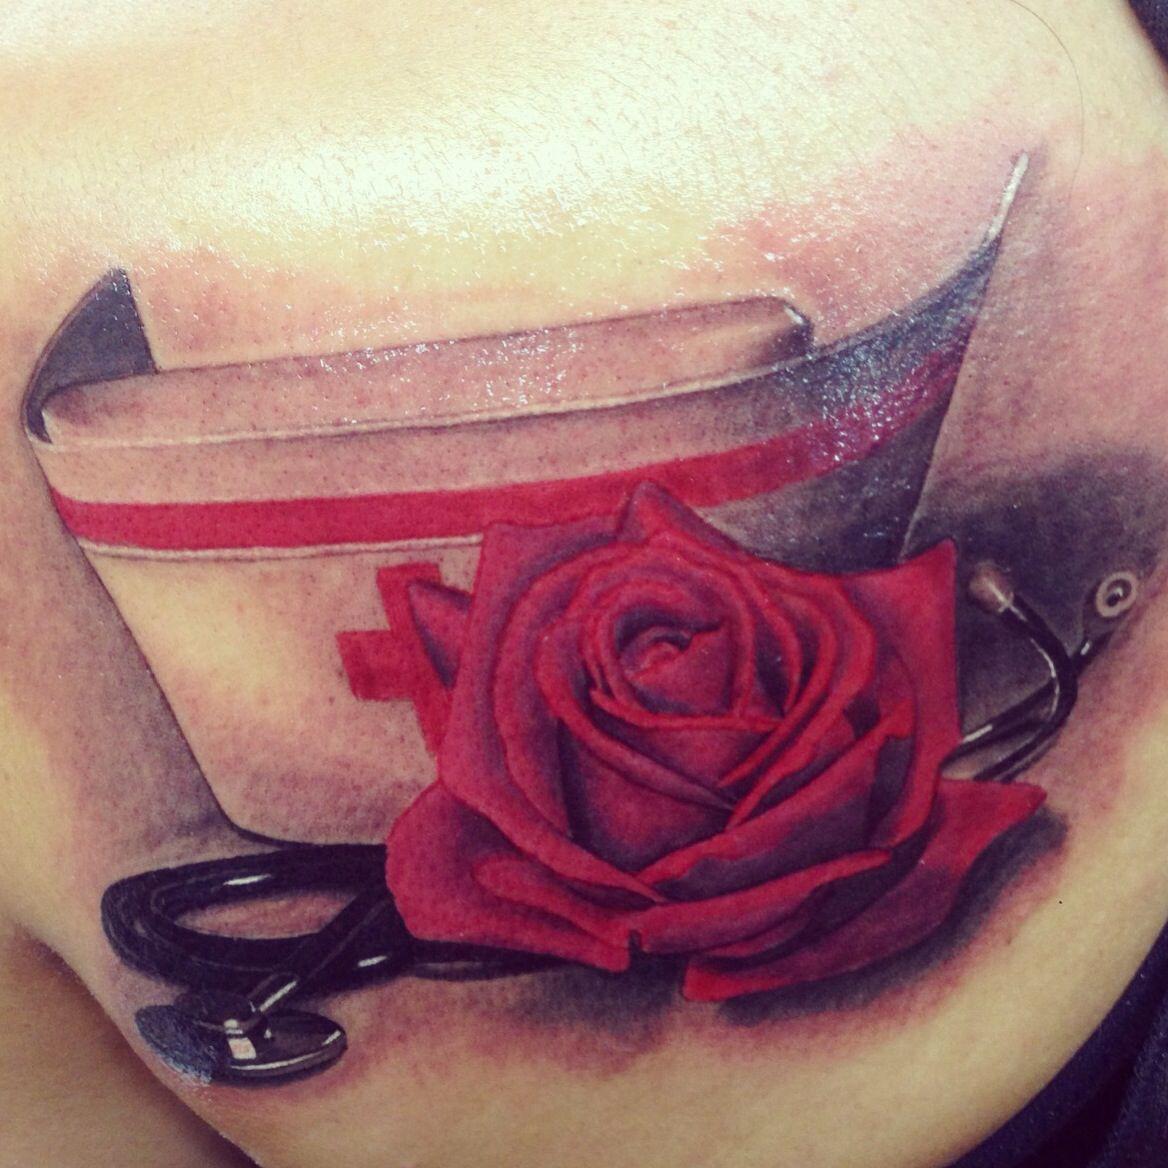 my nurse tattoo done by the talented danika at newport tattoo nurse hat cap stethoscope. Black Bedroom Furniture Sets. Home Design Ideas